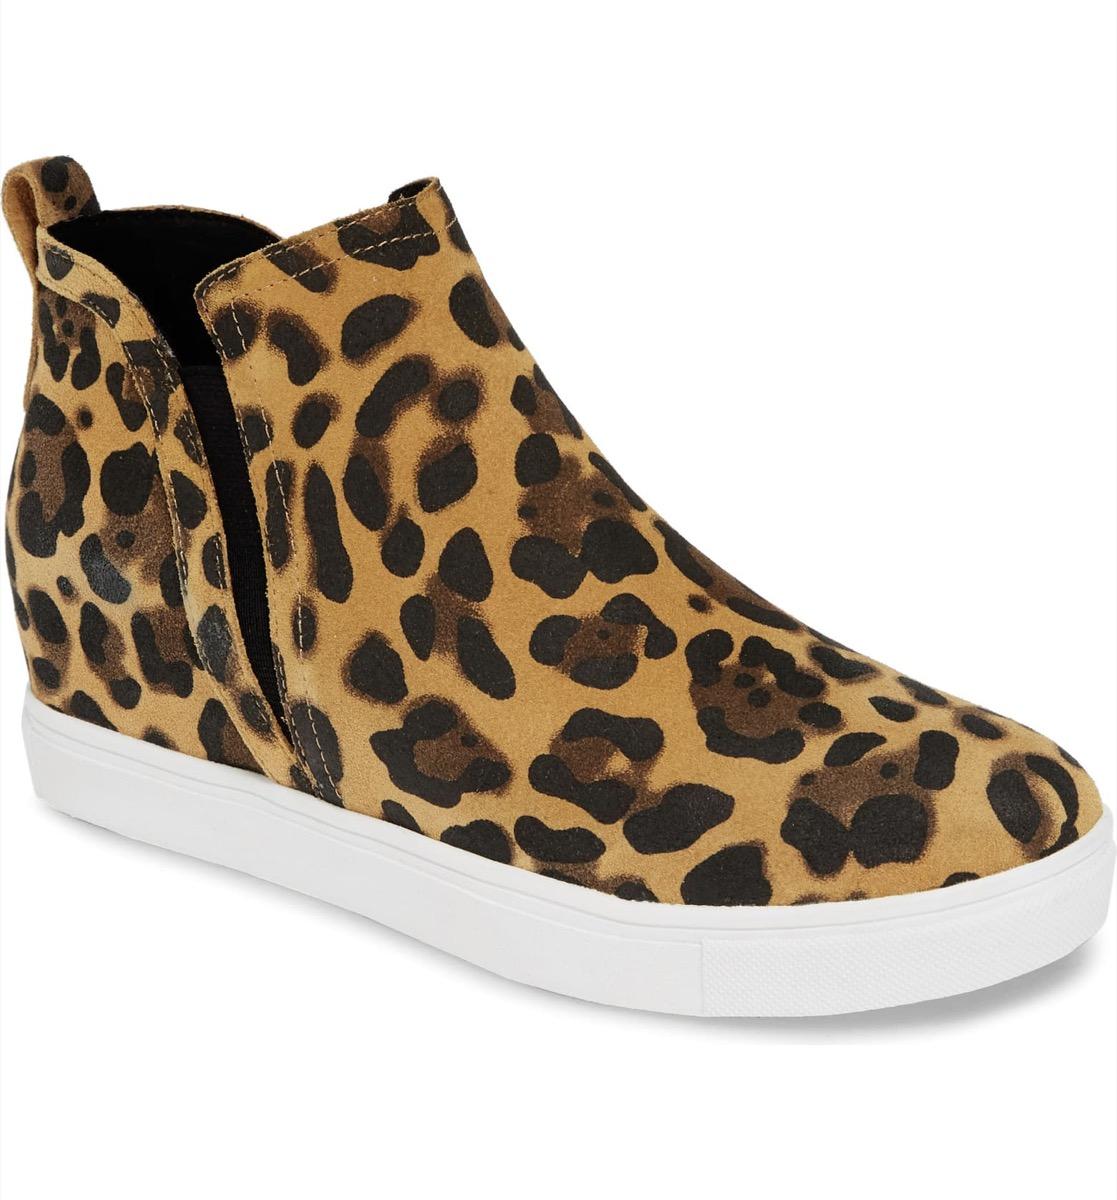 leopard-print sneakers, Nordstrom anniversary sale